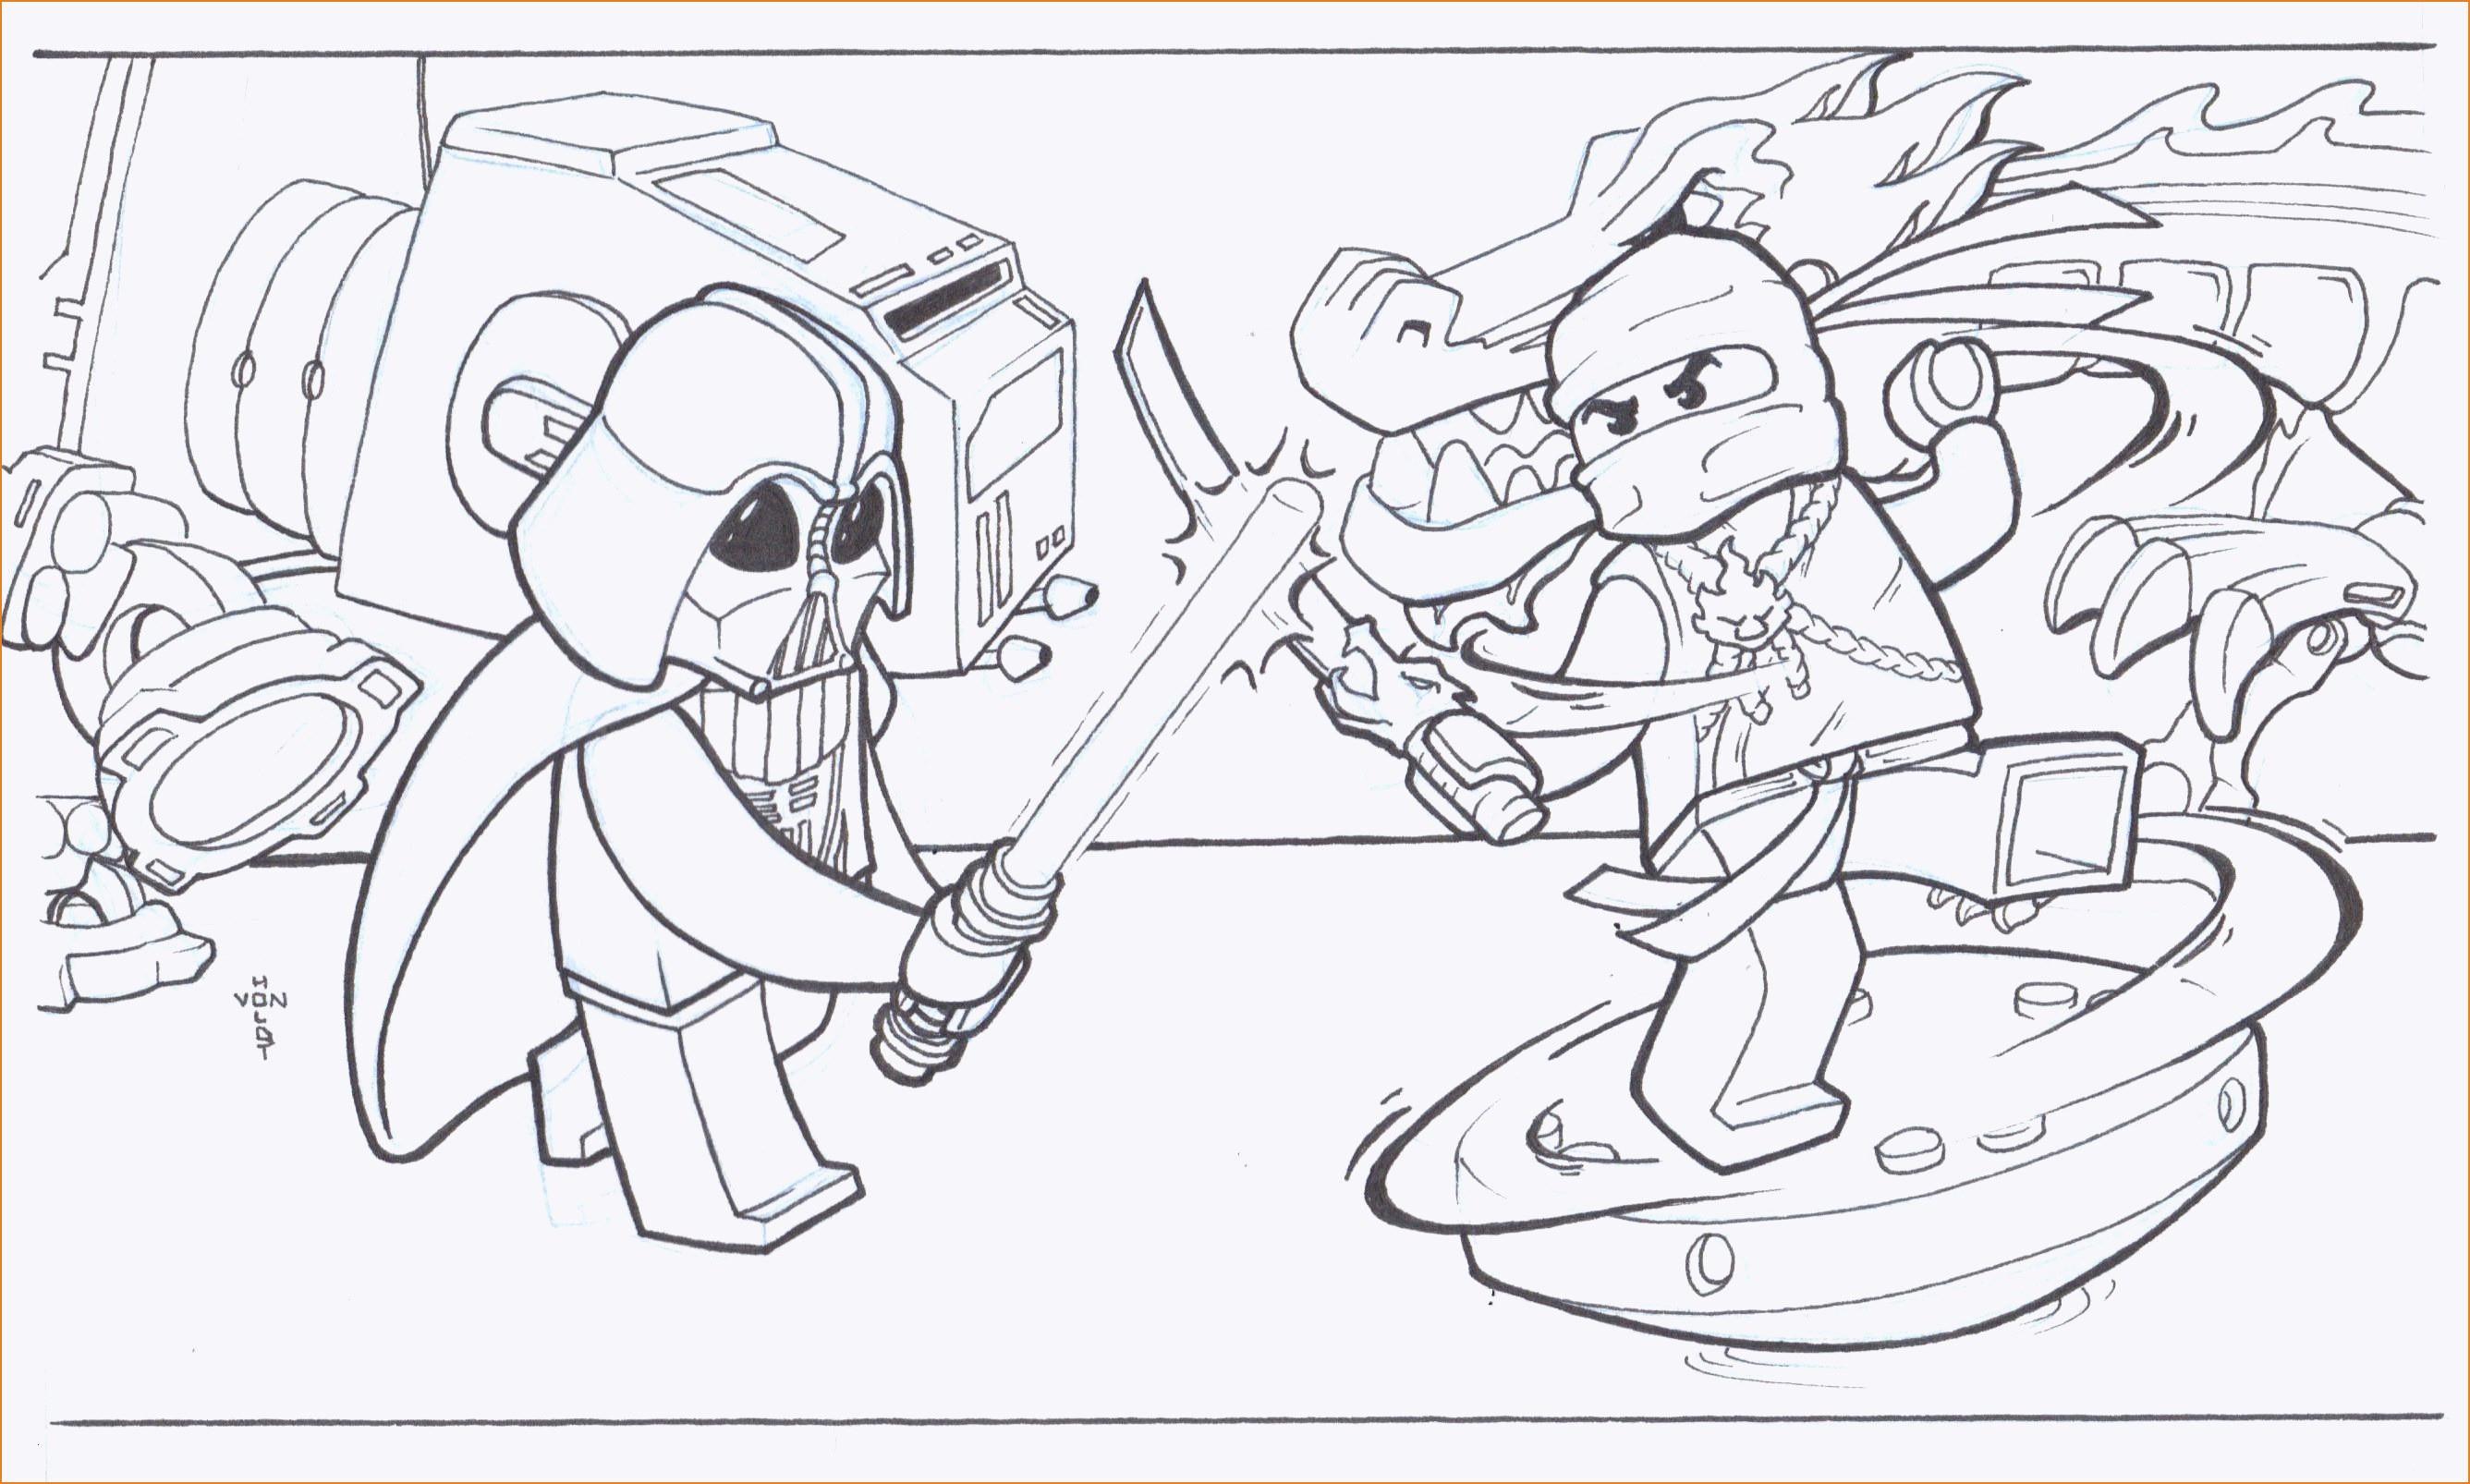 Ausmalbilder Ninjago Zum Ausdrucken Neu 40 Ninjago Ausmalbilder Zane Scoredatscore Genial Ninjago Das Bild